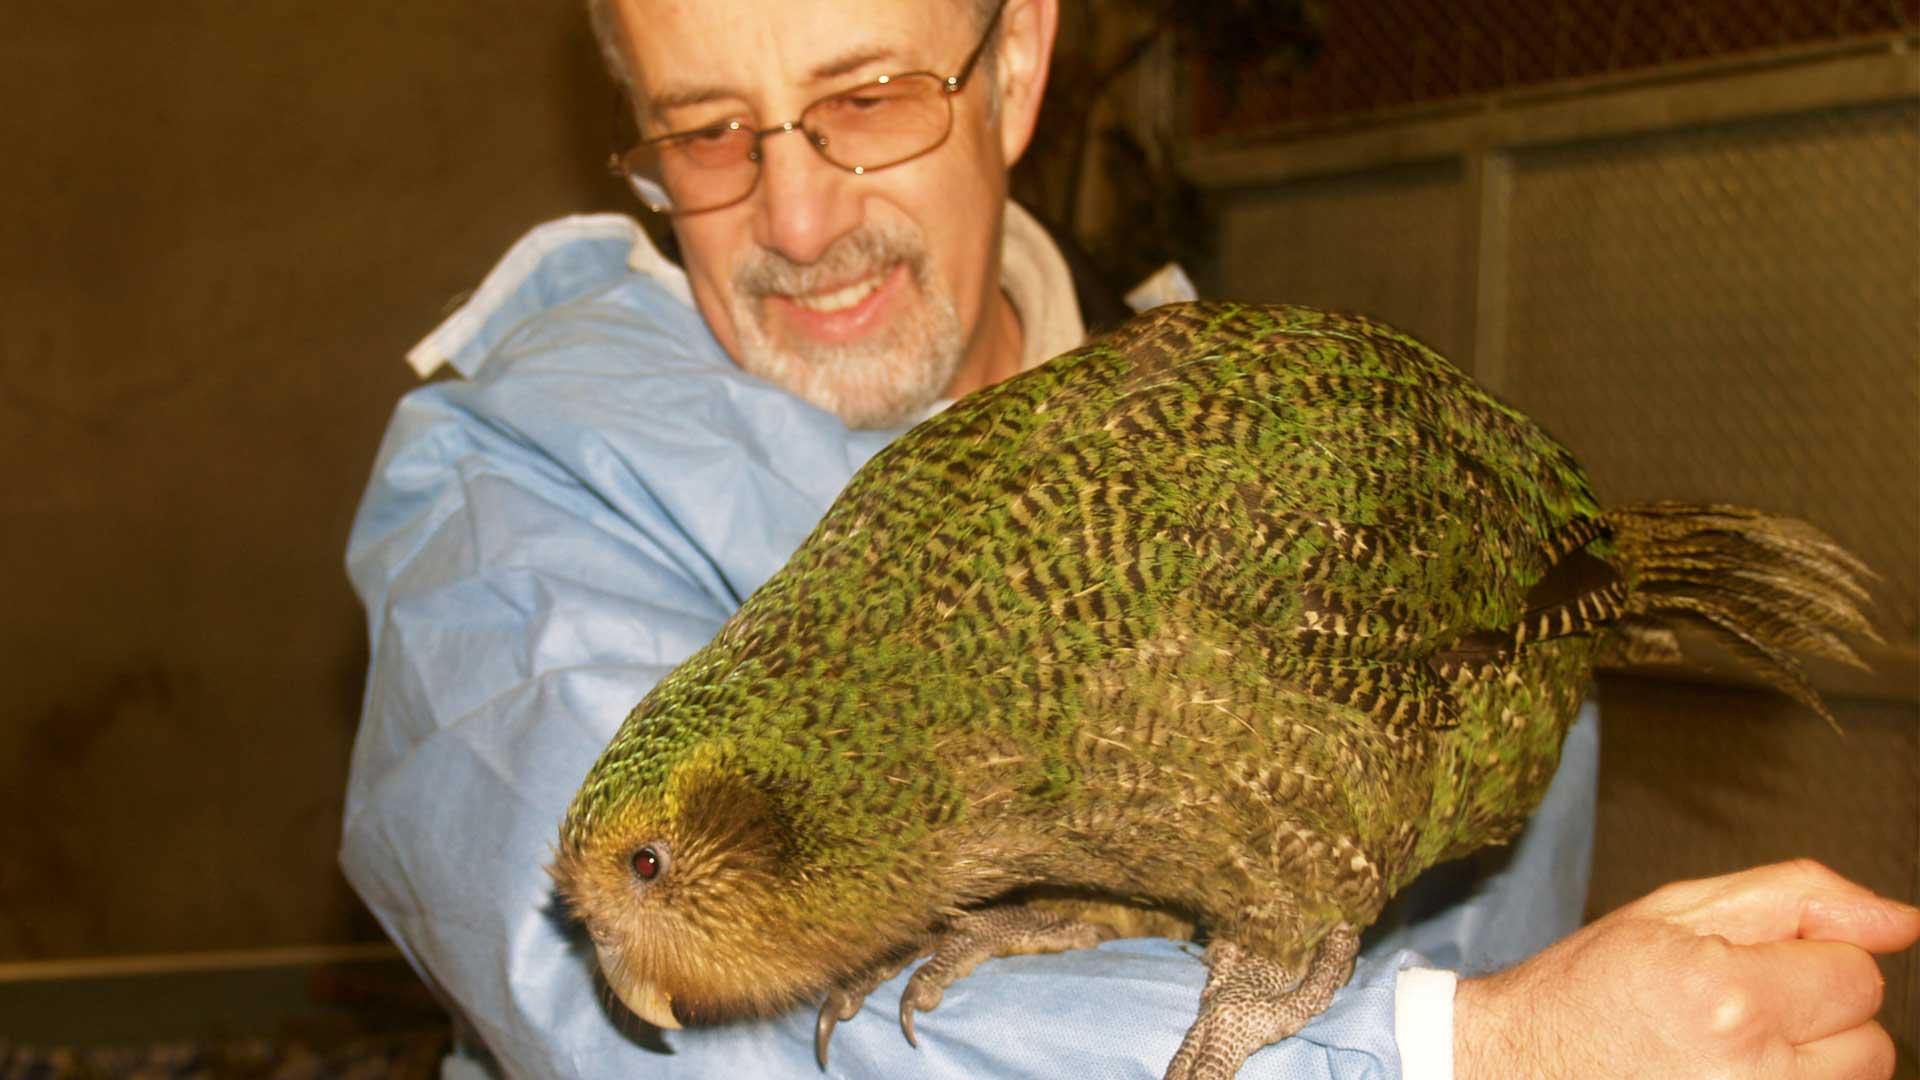 https://rfacdn.nz/zoo/assets/media/richard-kakapo-gallery-1.jpg